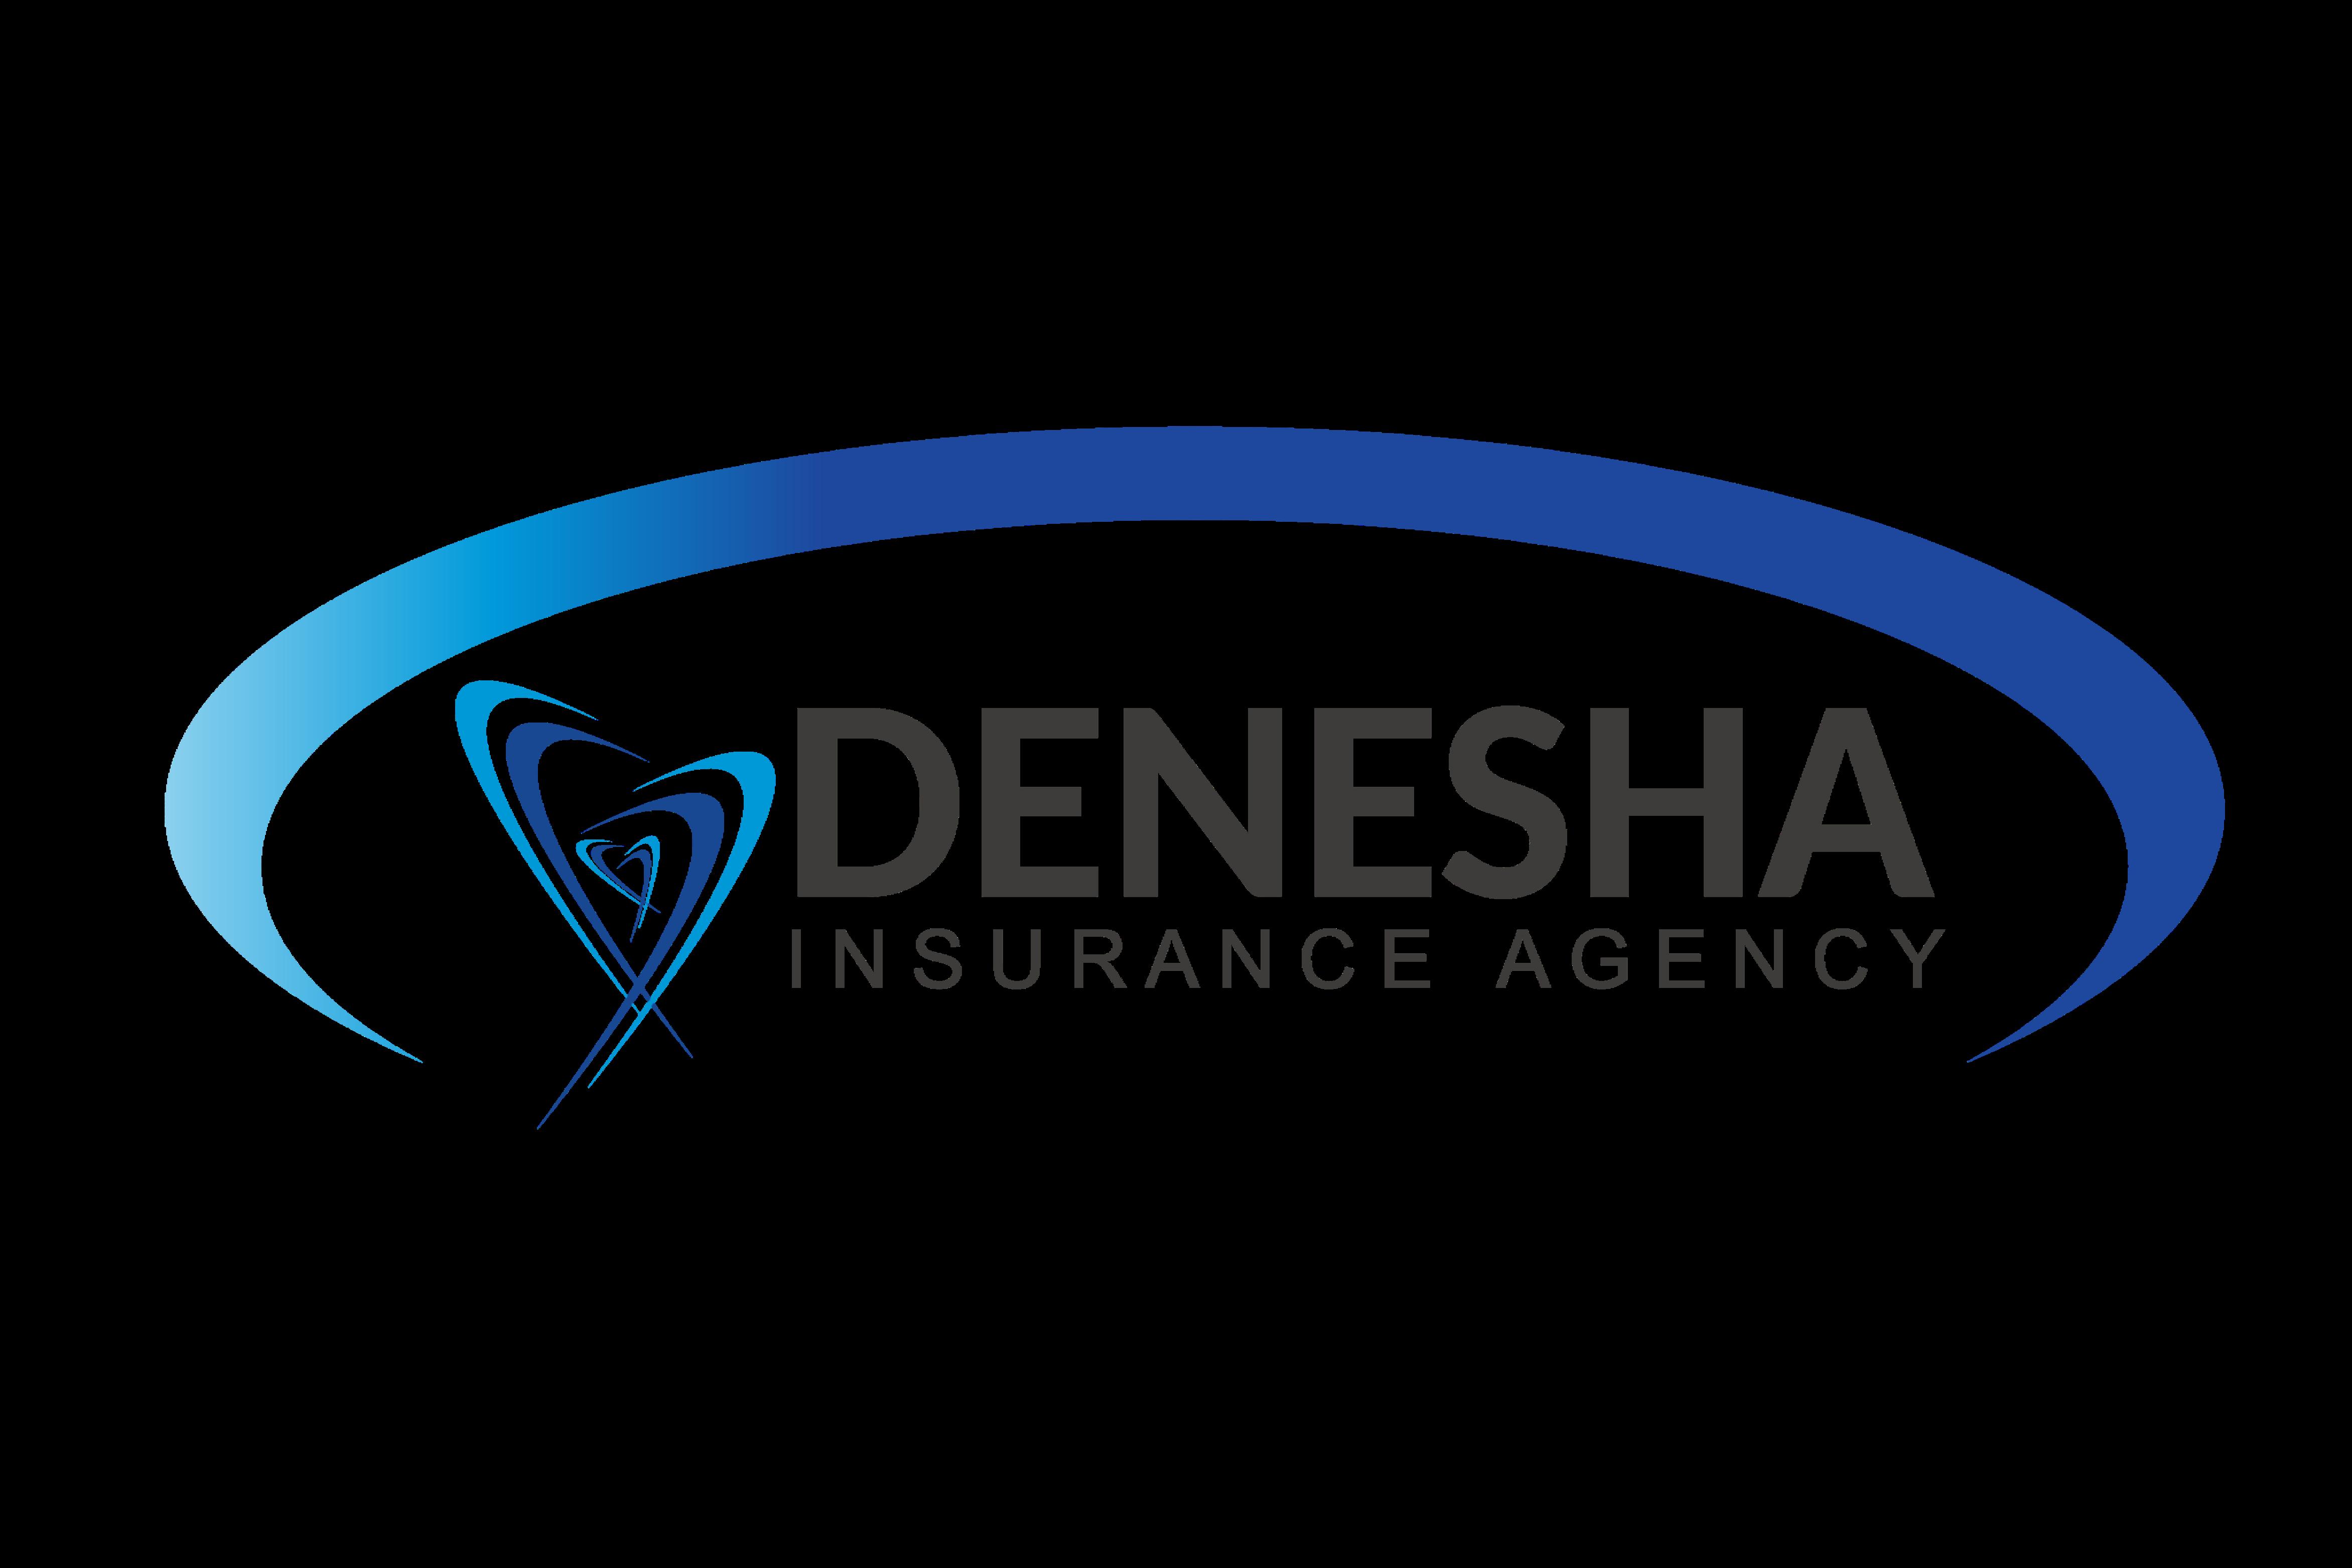 Denesha logo.png